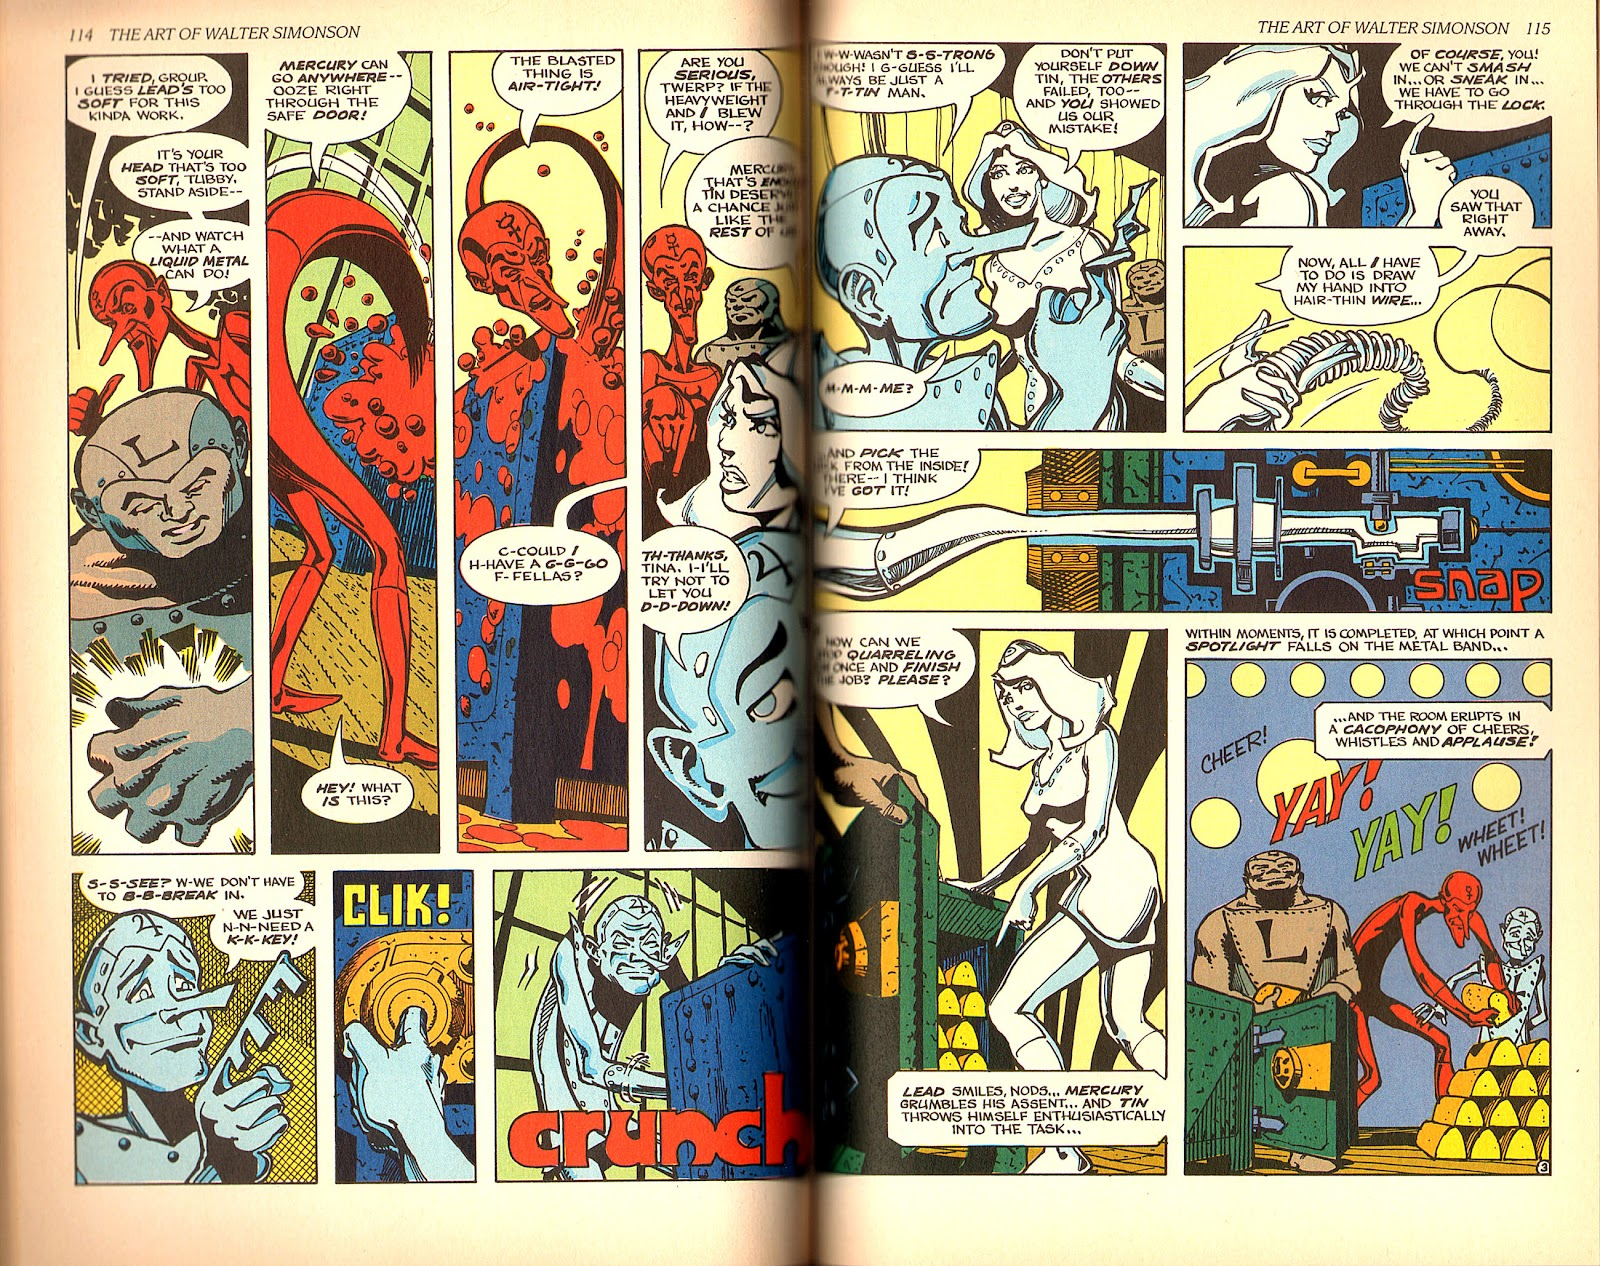 Read online The Art of Walter Simonson comic -  Issue # TPB - 59